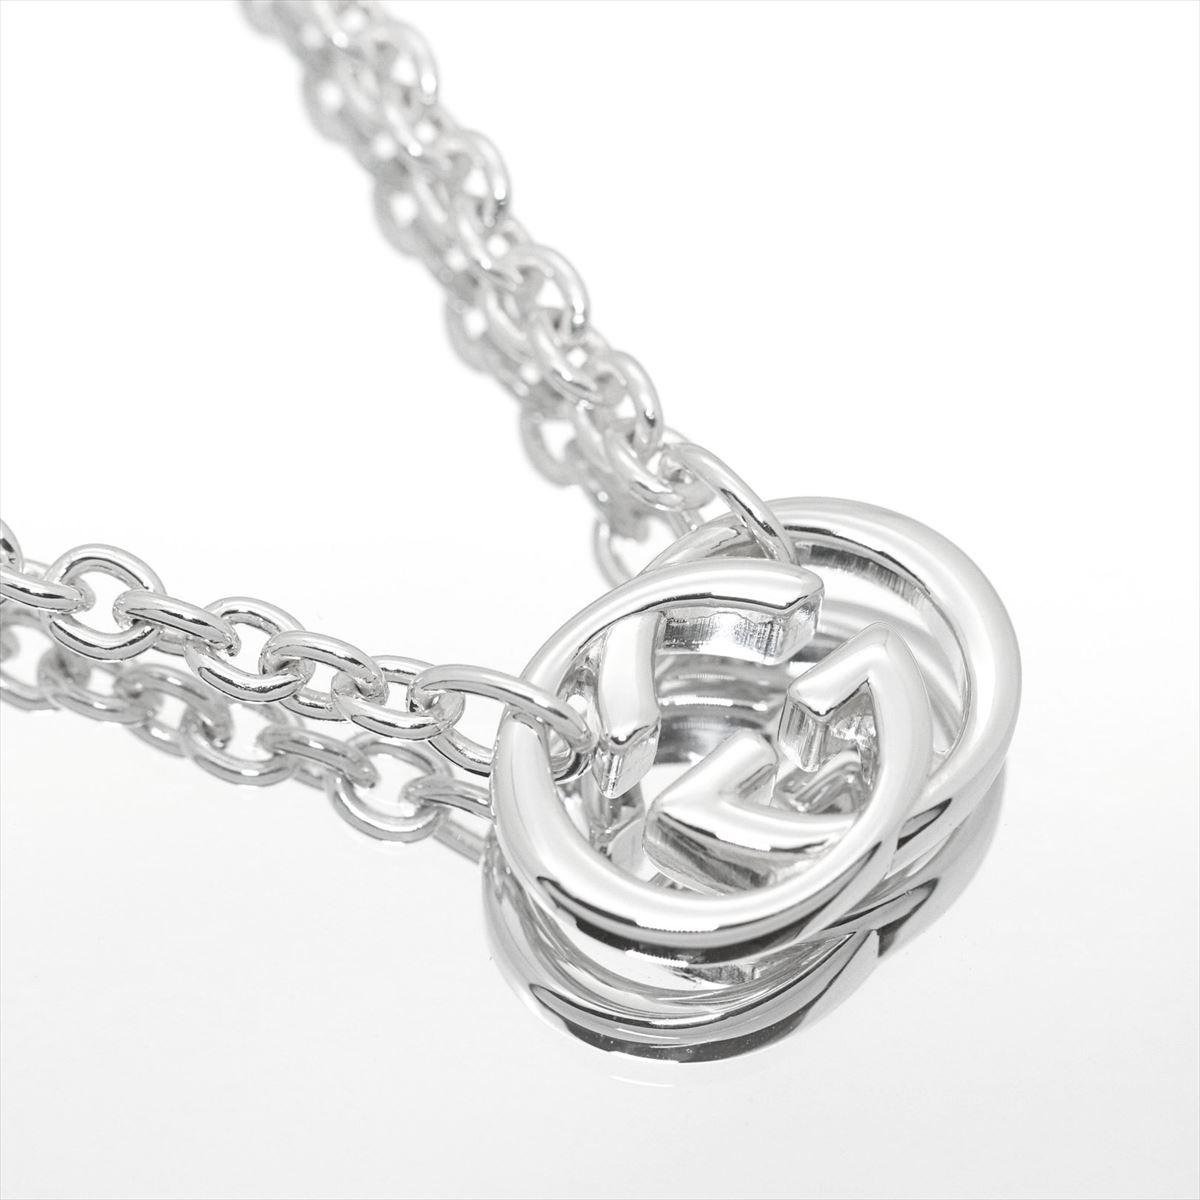 5b1dbd1b428e Gucci  GUCCI pair necklace GG necklace silver Bullitt pendant Lady s men  sterling silver SV925 190489 JJ8400 8106  45cm